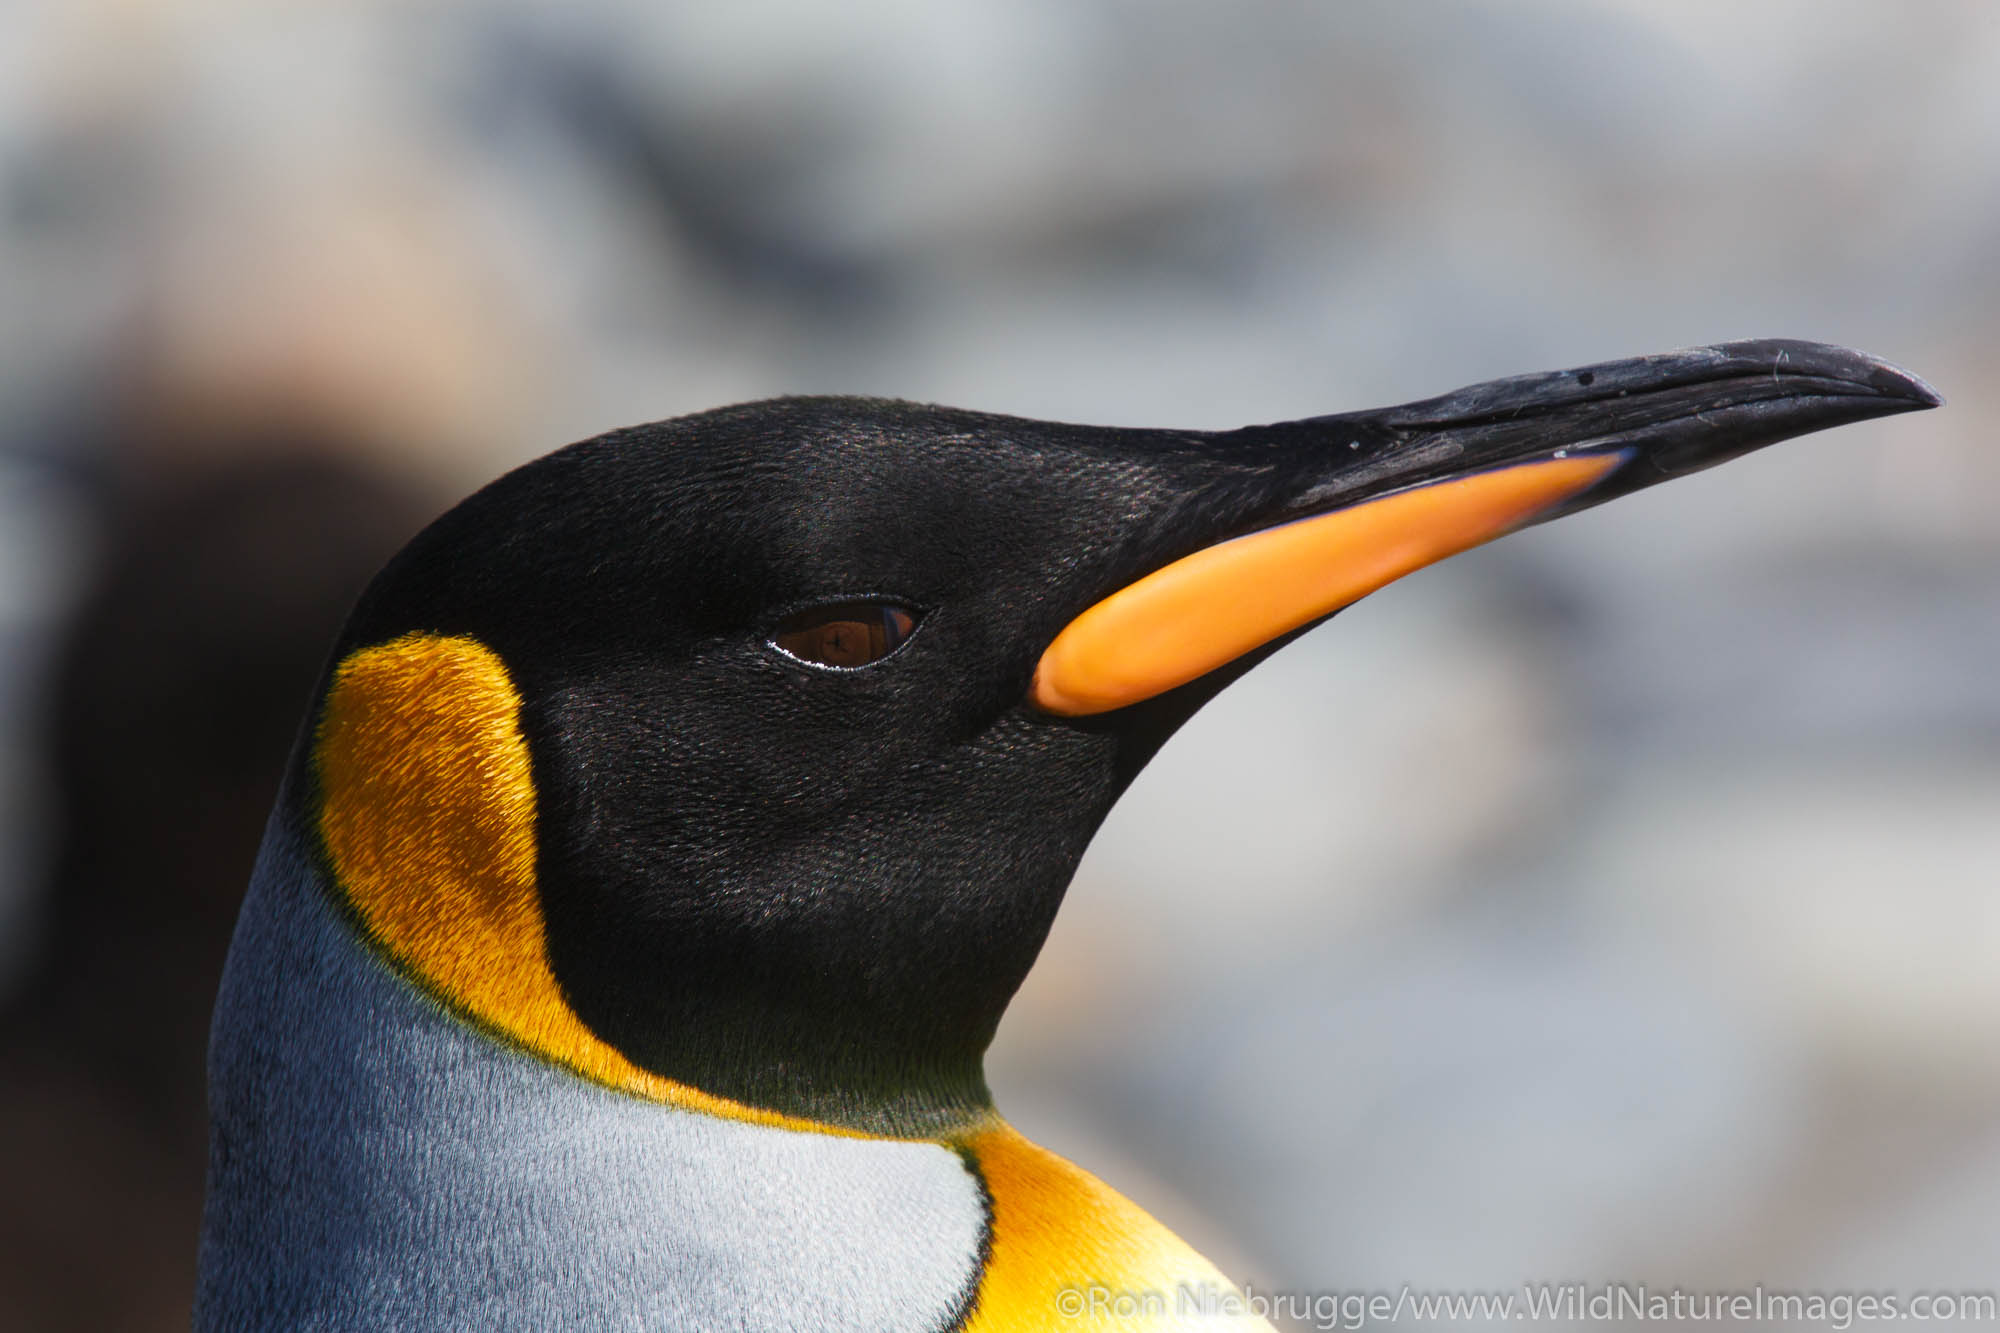 King penguin (Aptenodytes patagonicus) on the Salisbury Plain, South Georgia, Antarctica.